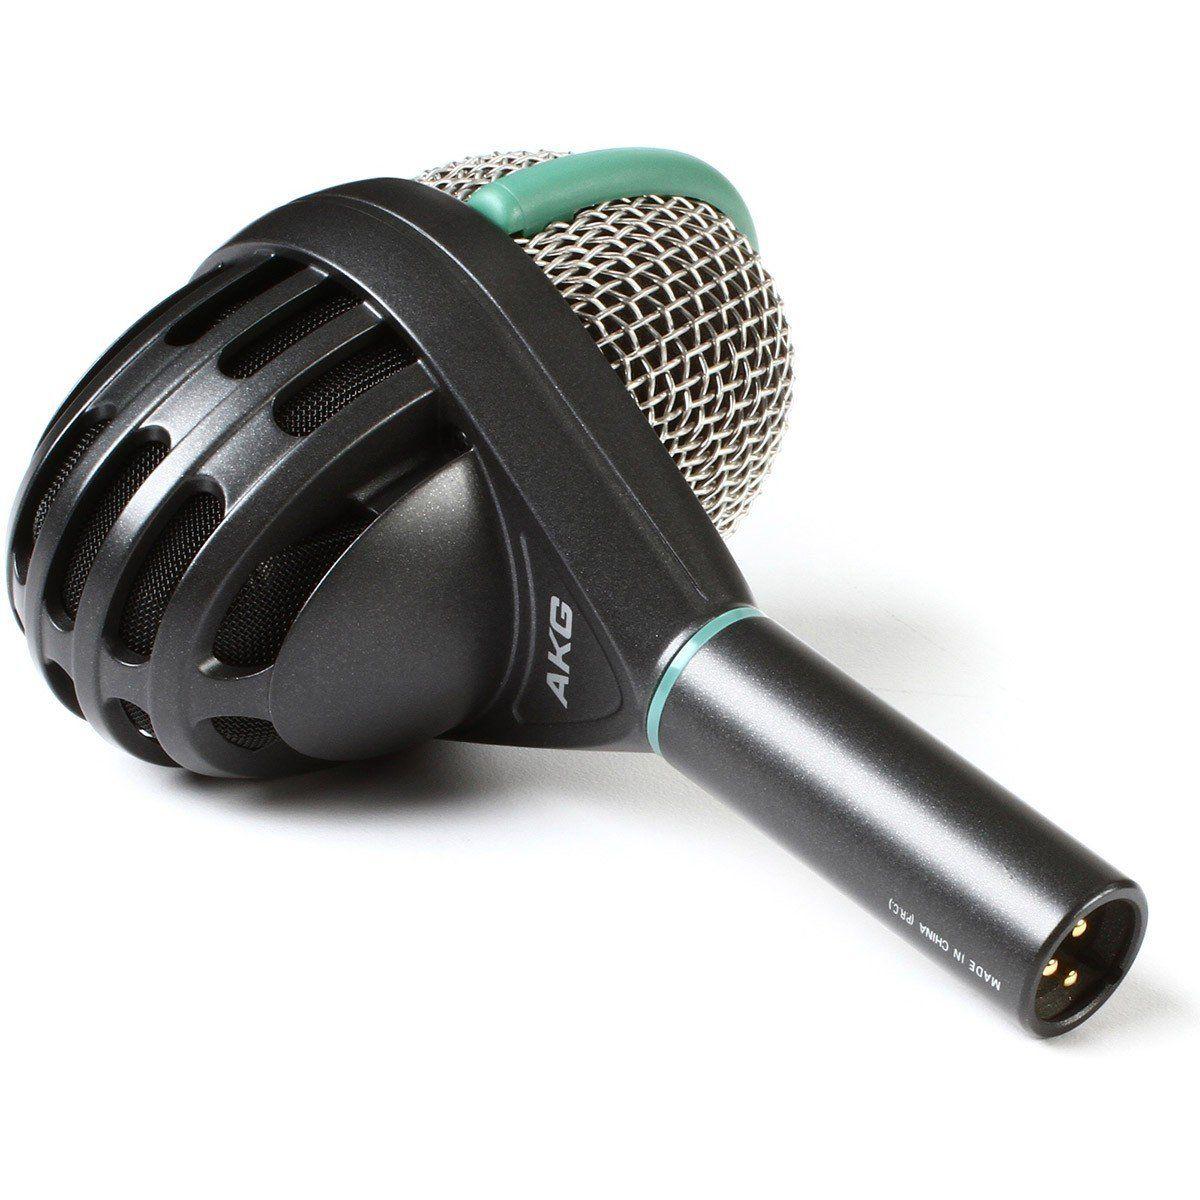 Akg D112 Microfone Dinâmico Akg D-112 para Instrumentos de Graves